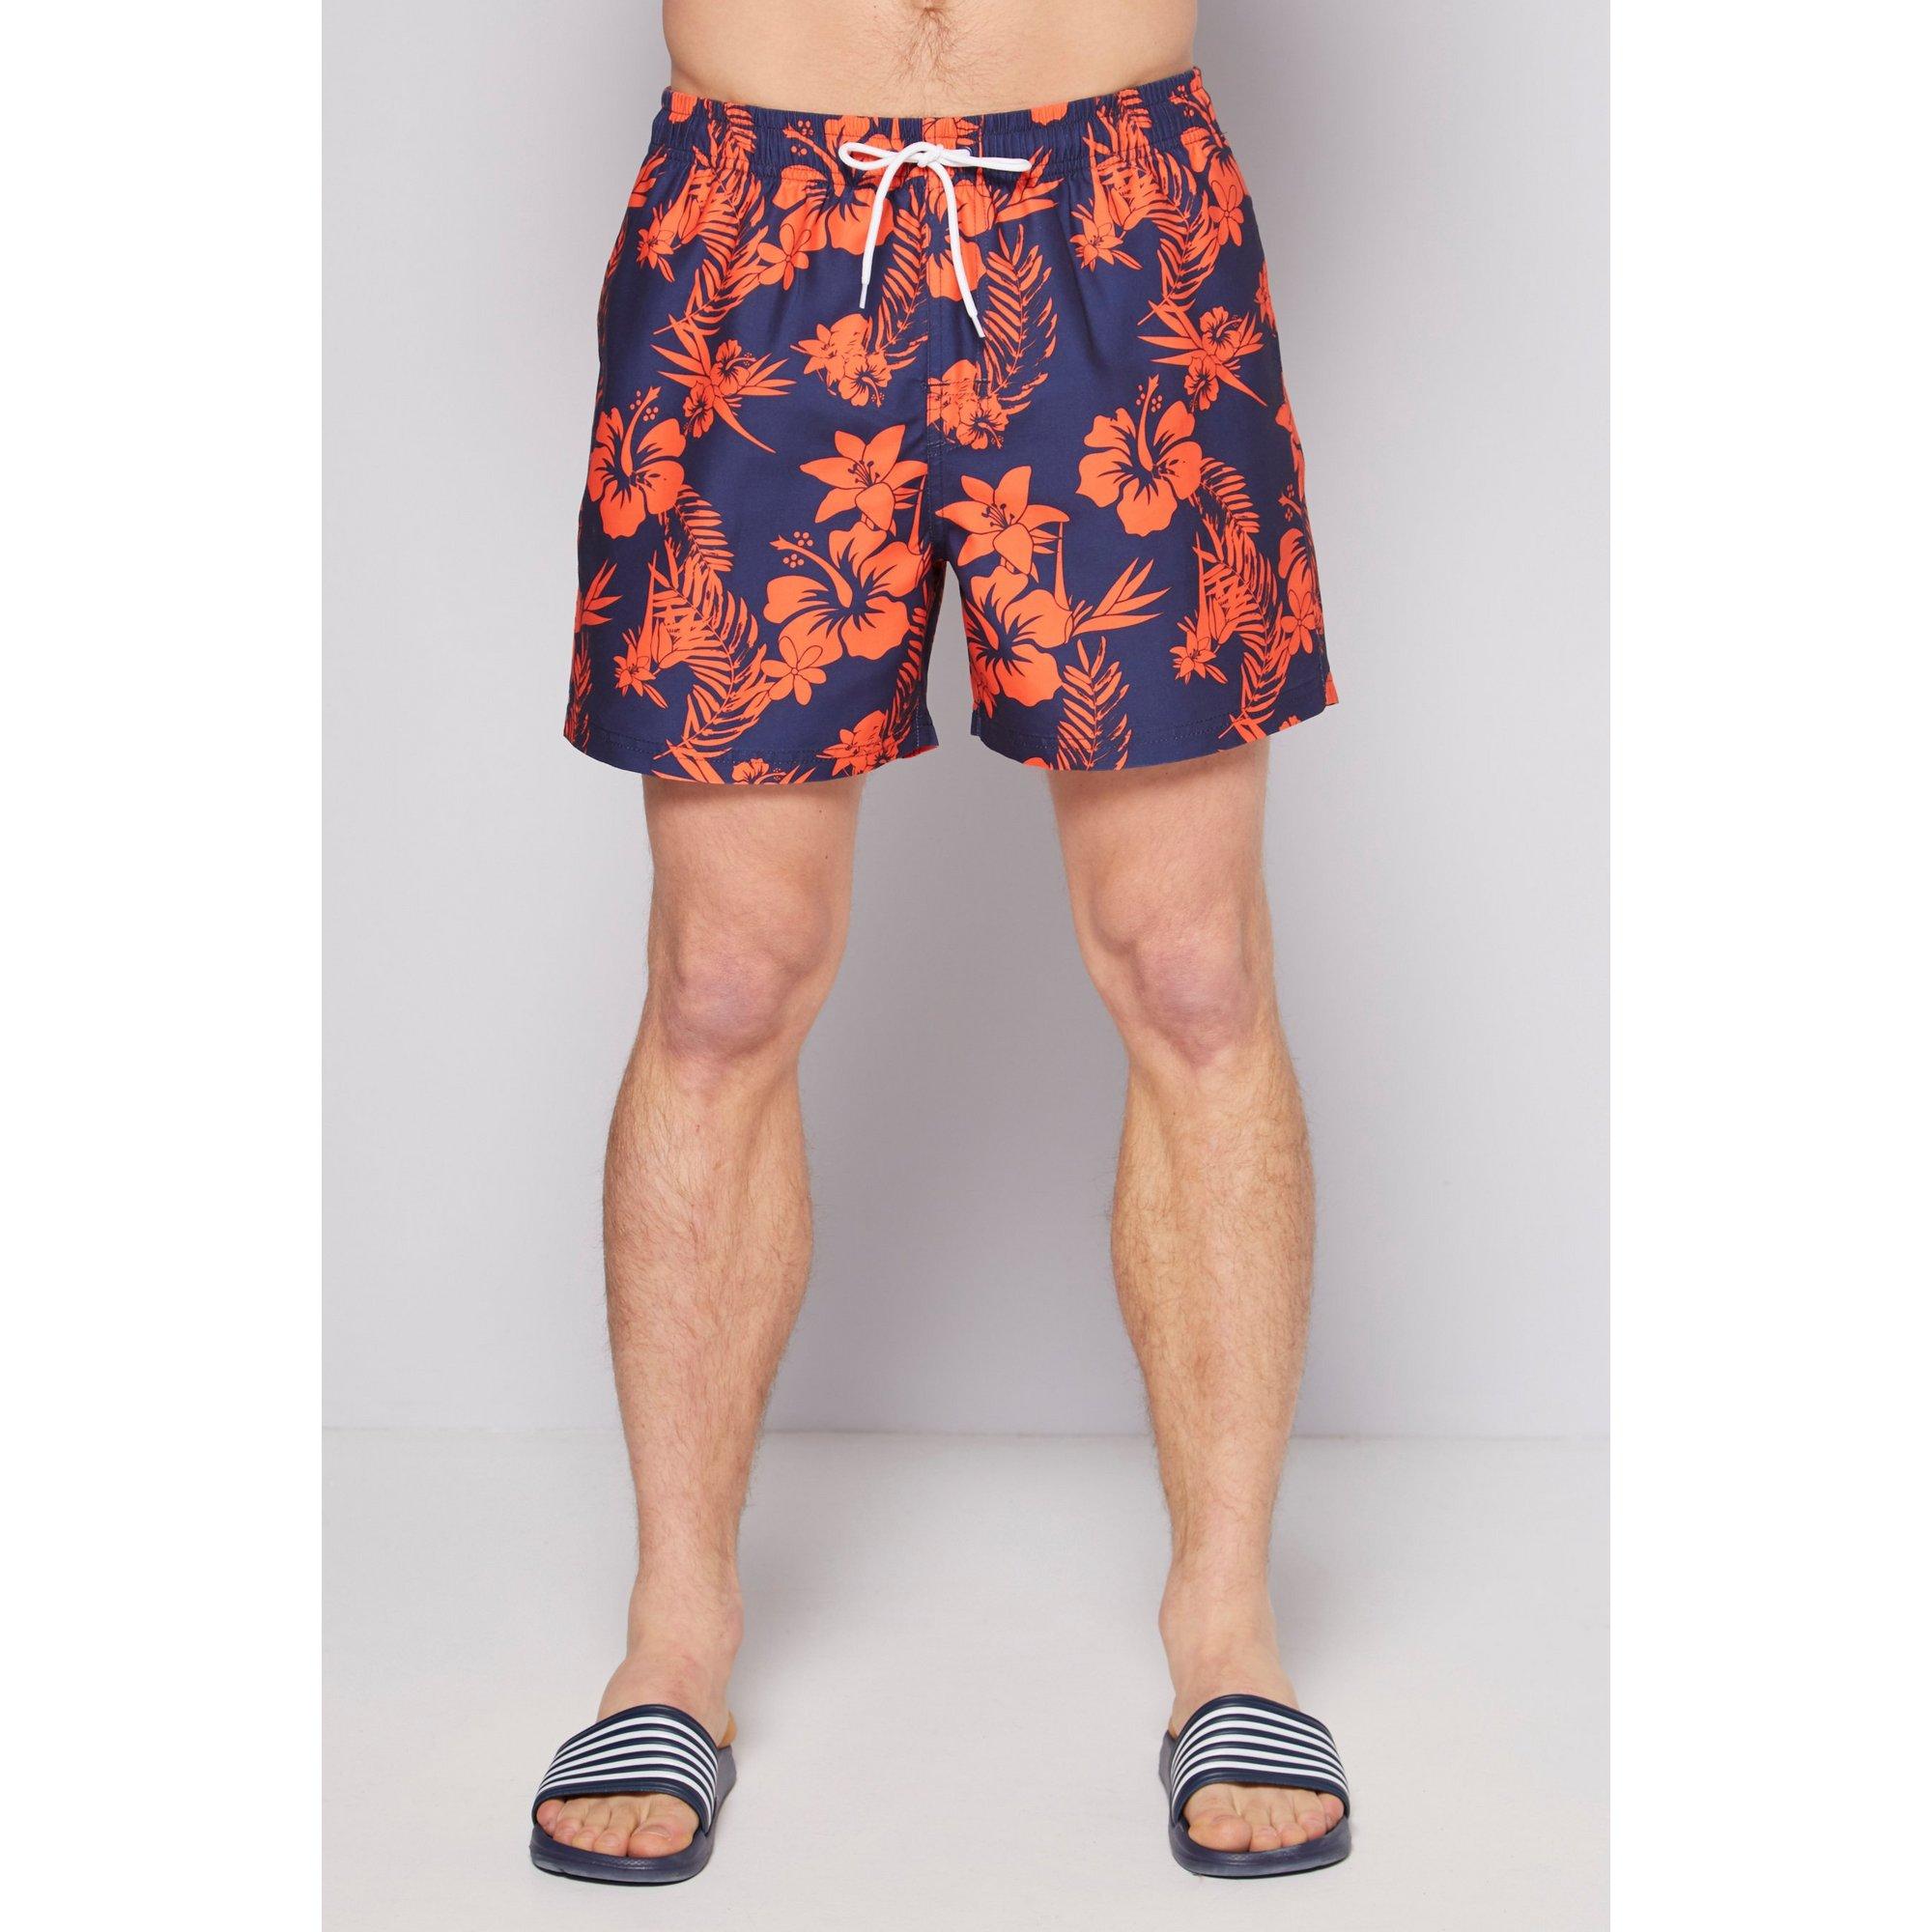 Image of Fashion Floral Swim Shorts